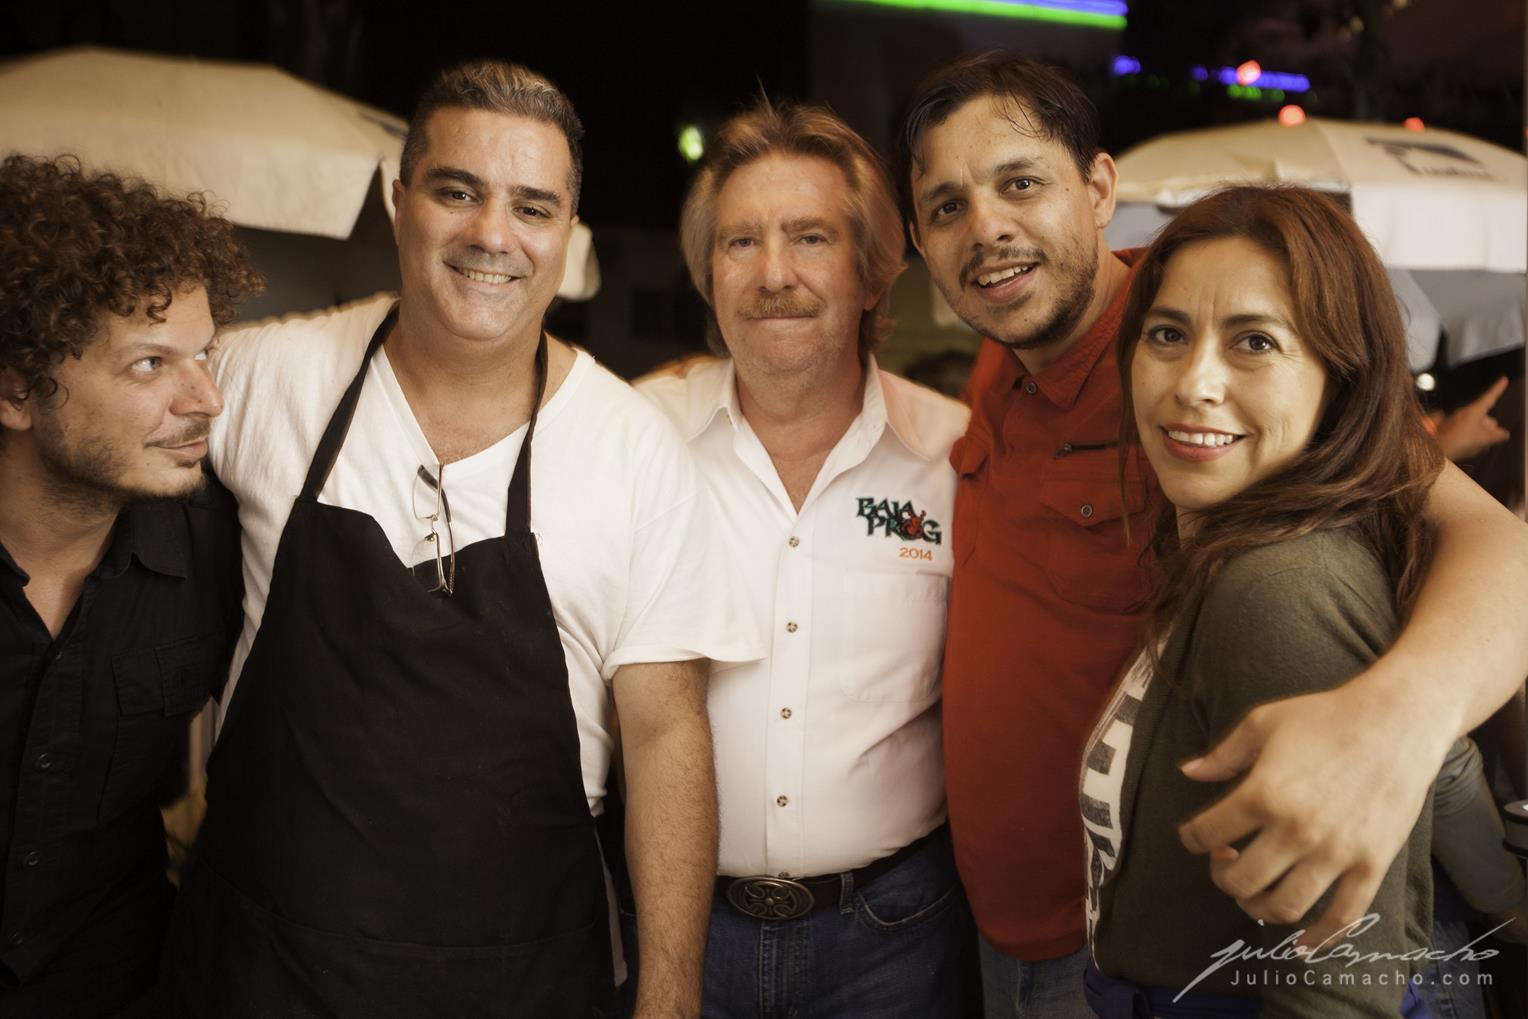 2014-10-30 31 CAST TOUR Ensenada y Tijuana - 1849 - www.Juli (Copy).jpg